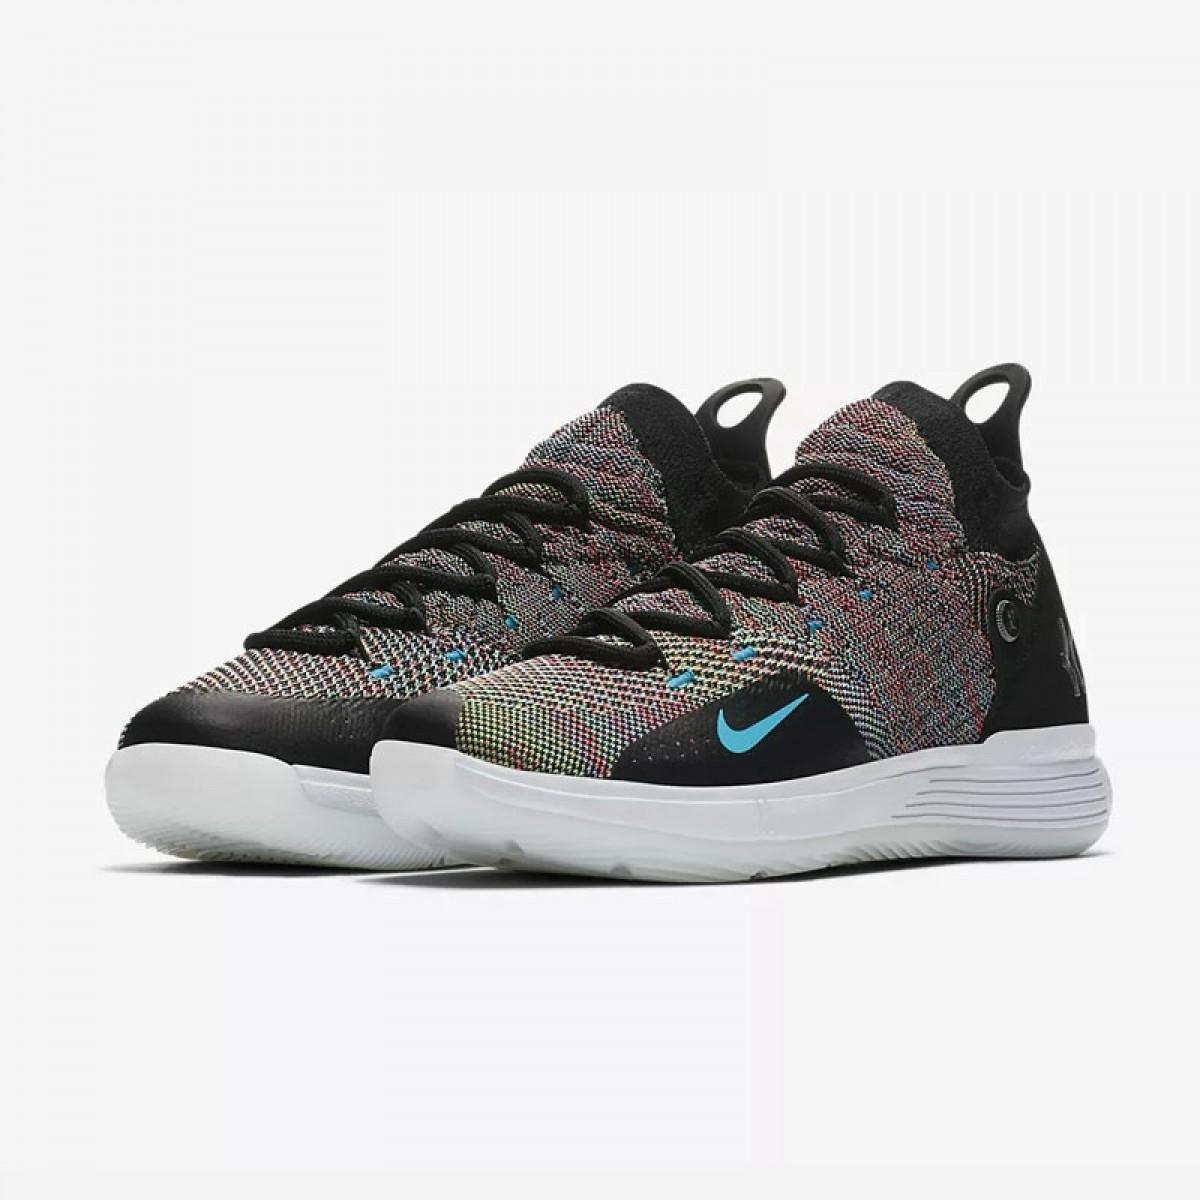 Nike KD 11 GS 'Multicolor' AH3465-001